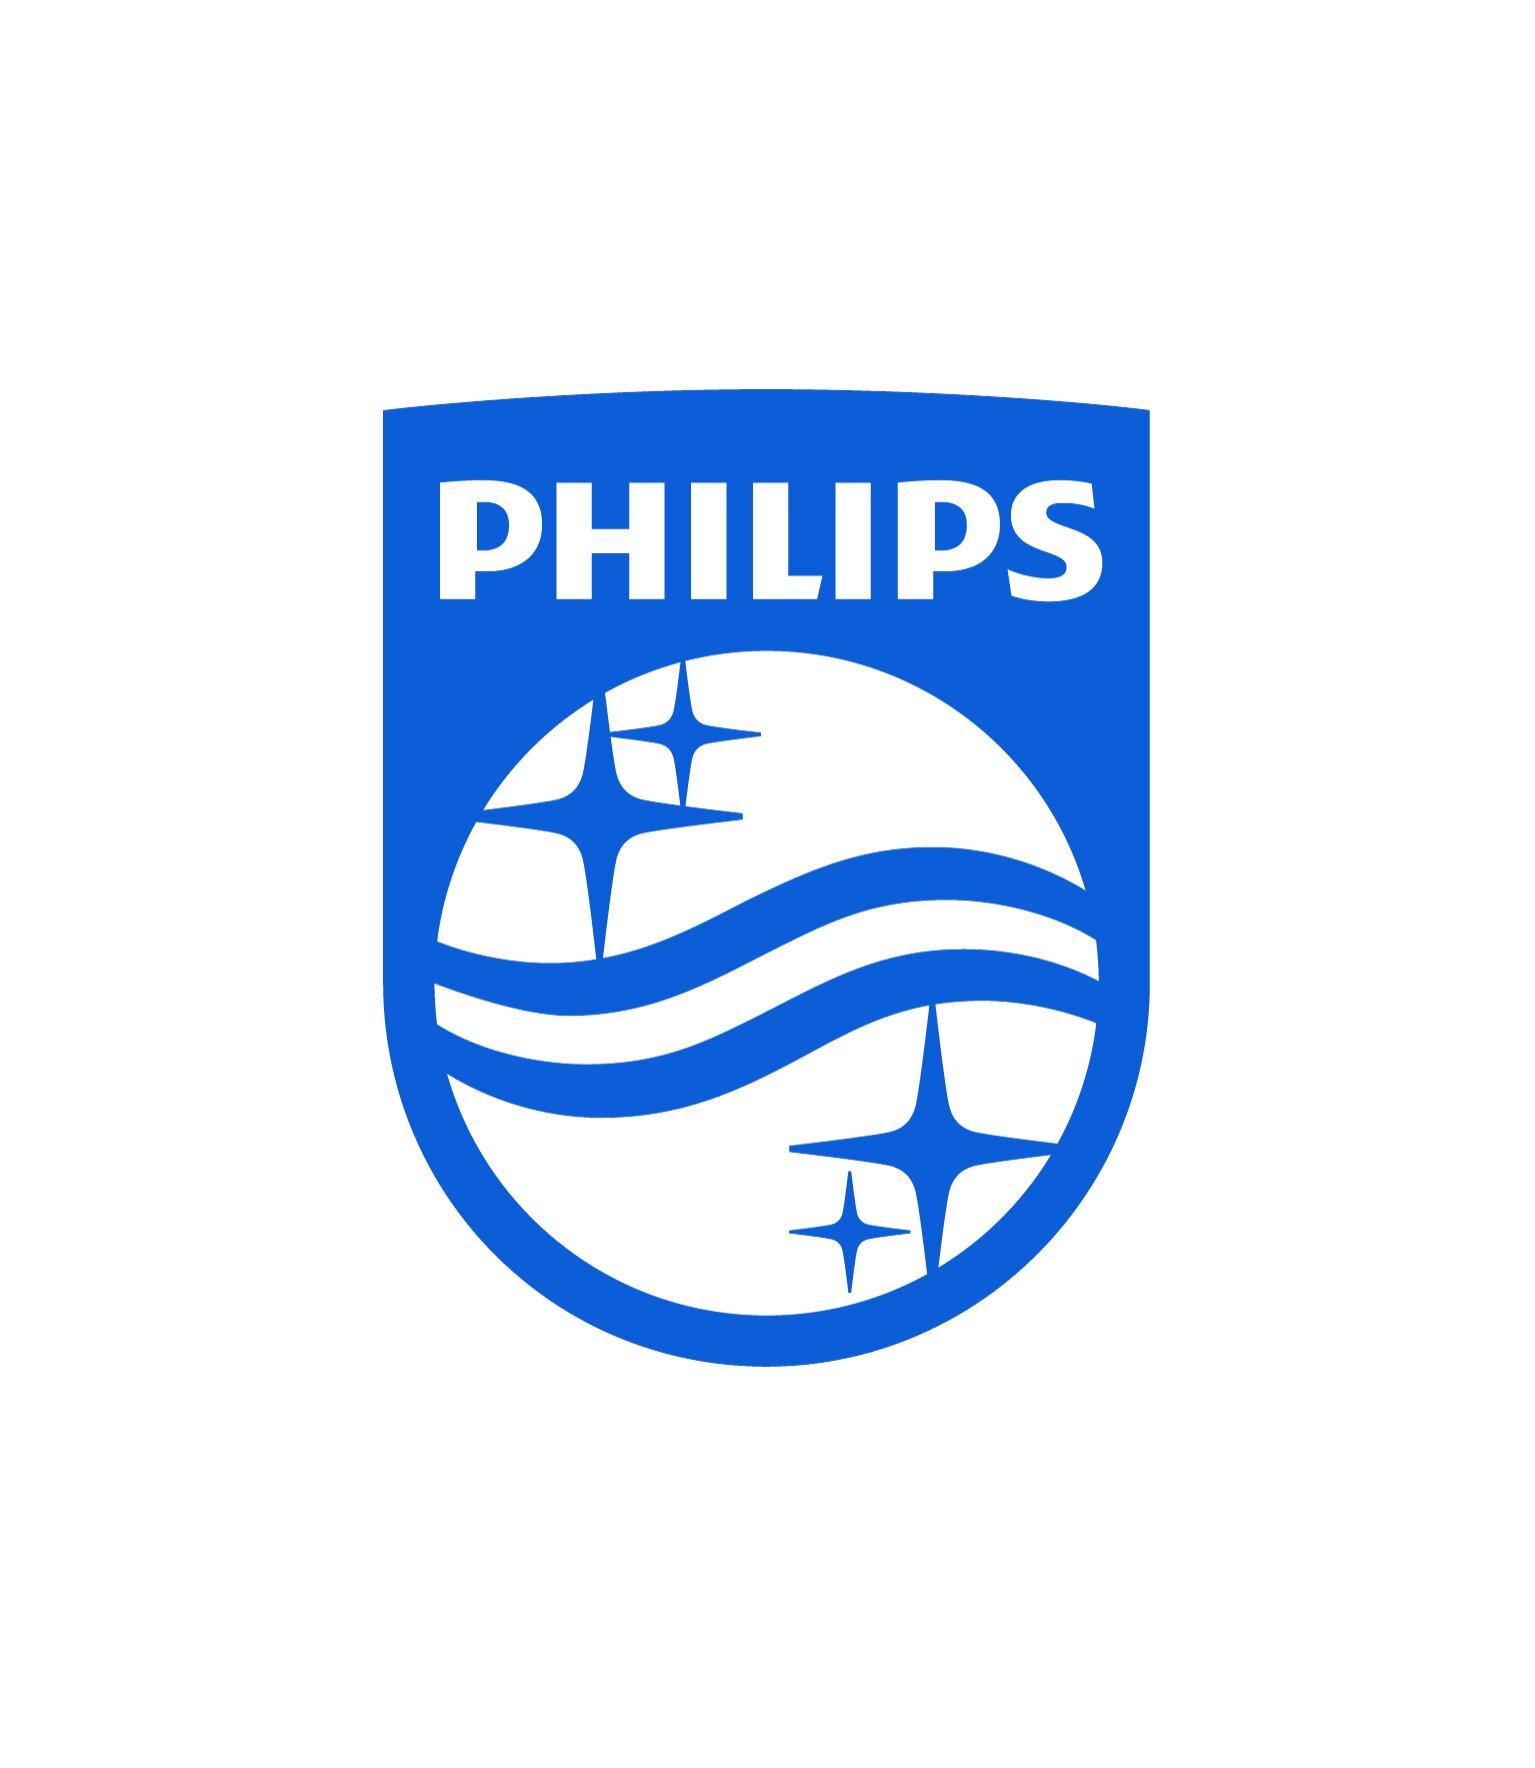 PHILIPS SHIELD